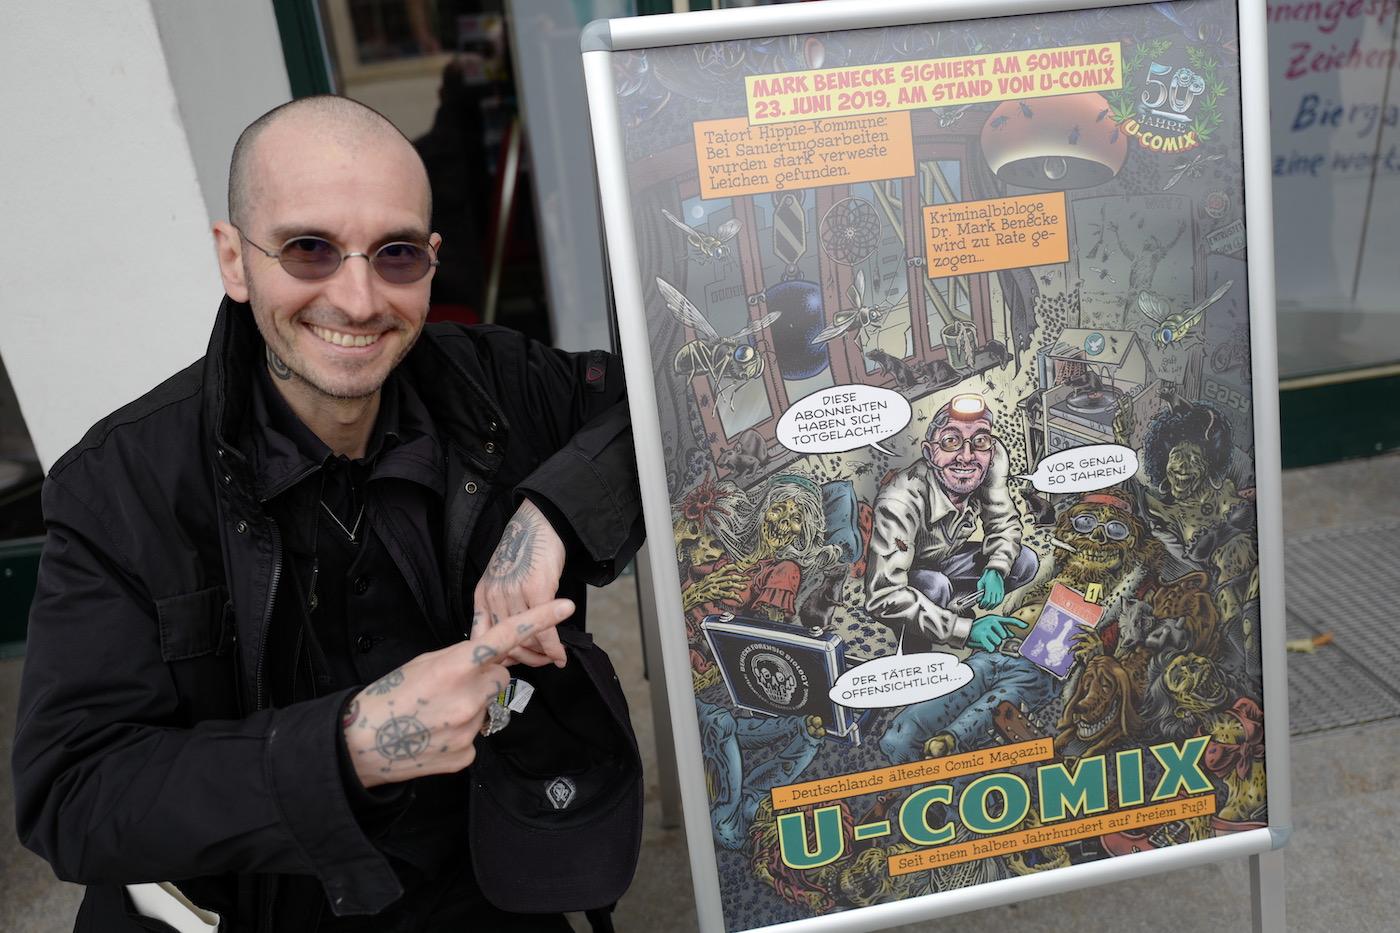 mark_benecke_comic_festival_muenchen_munich_comic_con_2019 - 2.jpg